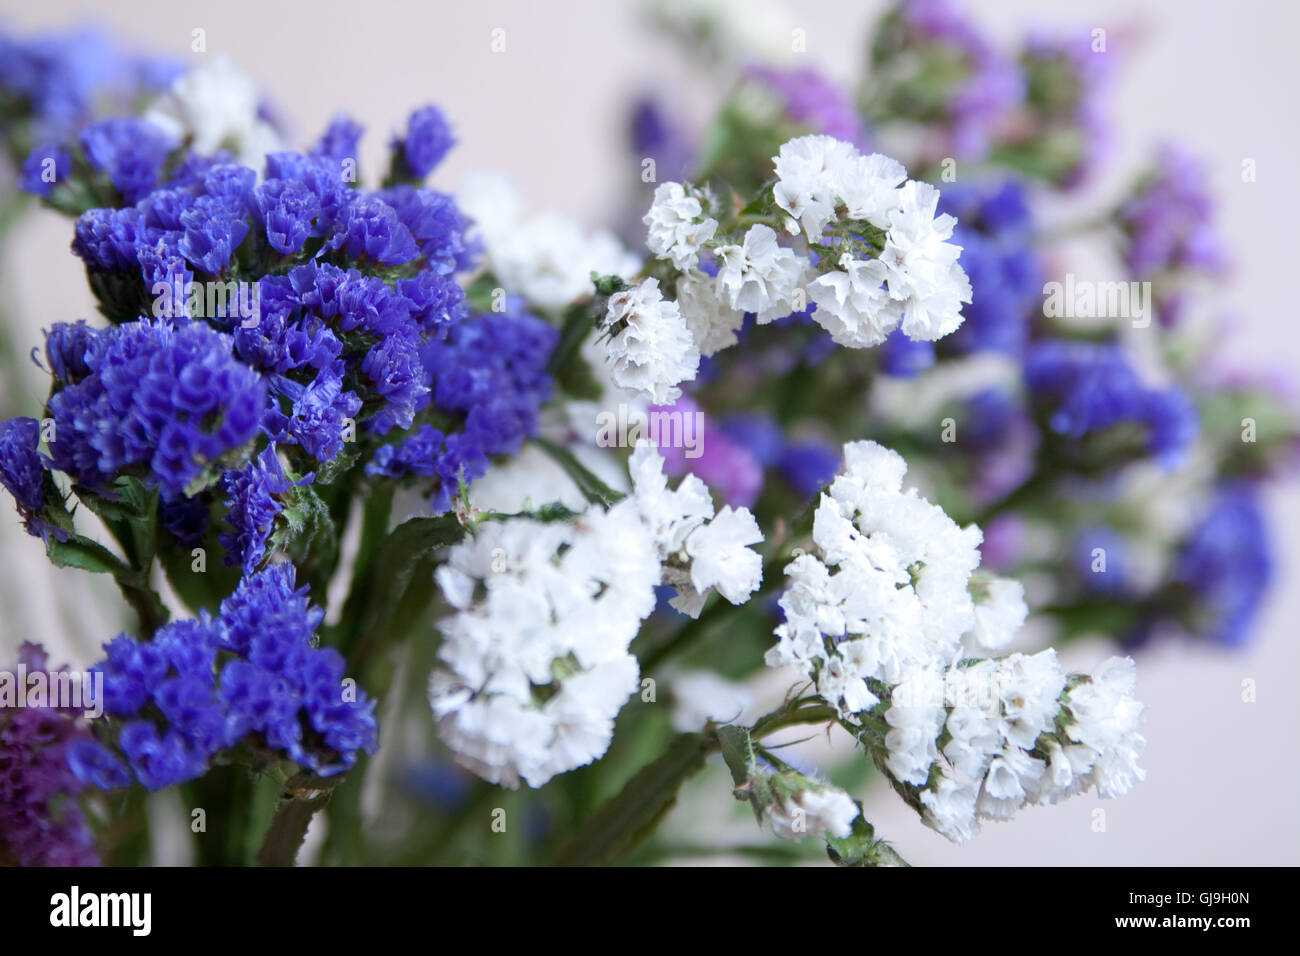 Blue everlasting flower choice image flower wallpaper hd blue everlasting flower images flower wallpaper hd blue everlasting flower gallery flower wallpaper hd bouquet everlasting izmirmasajfo